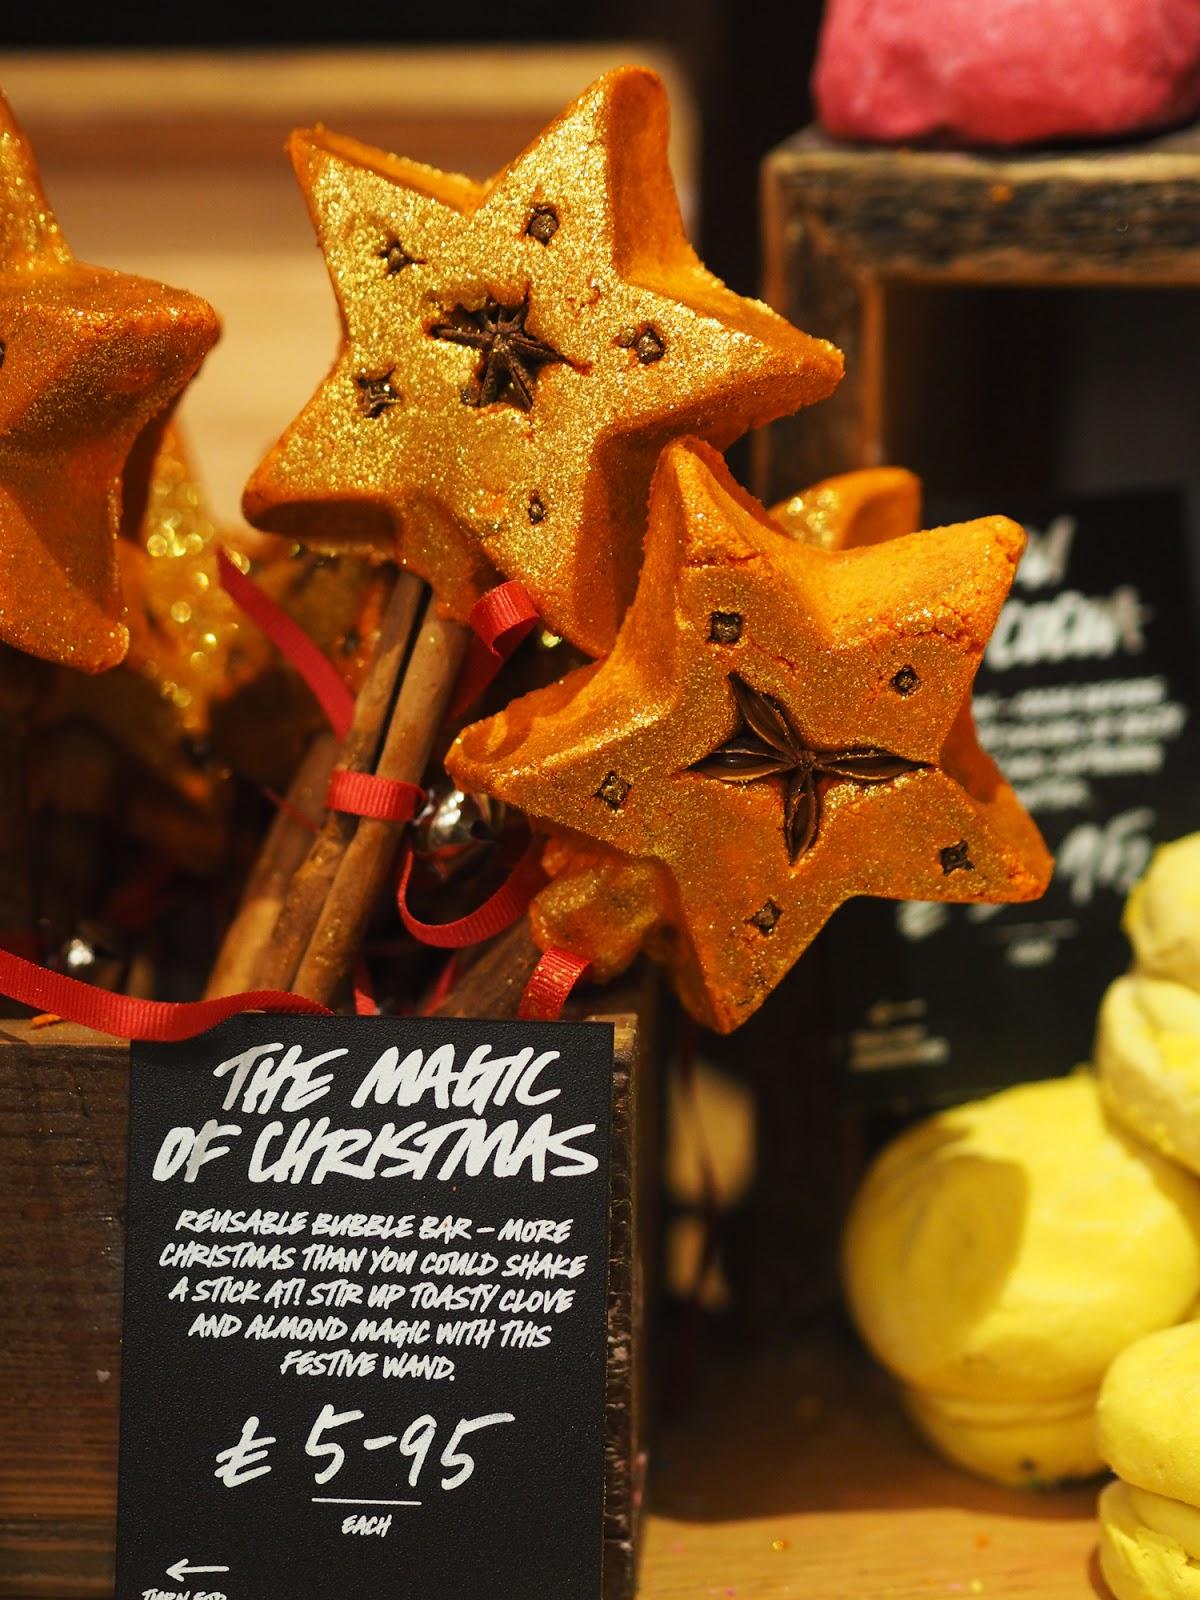 Lush The Magic of Christmas Wand